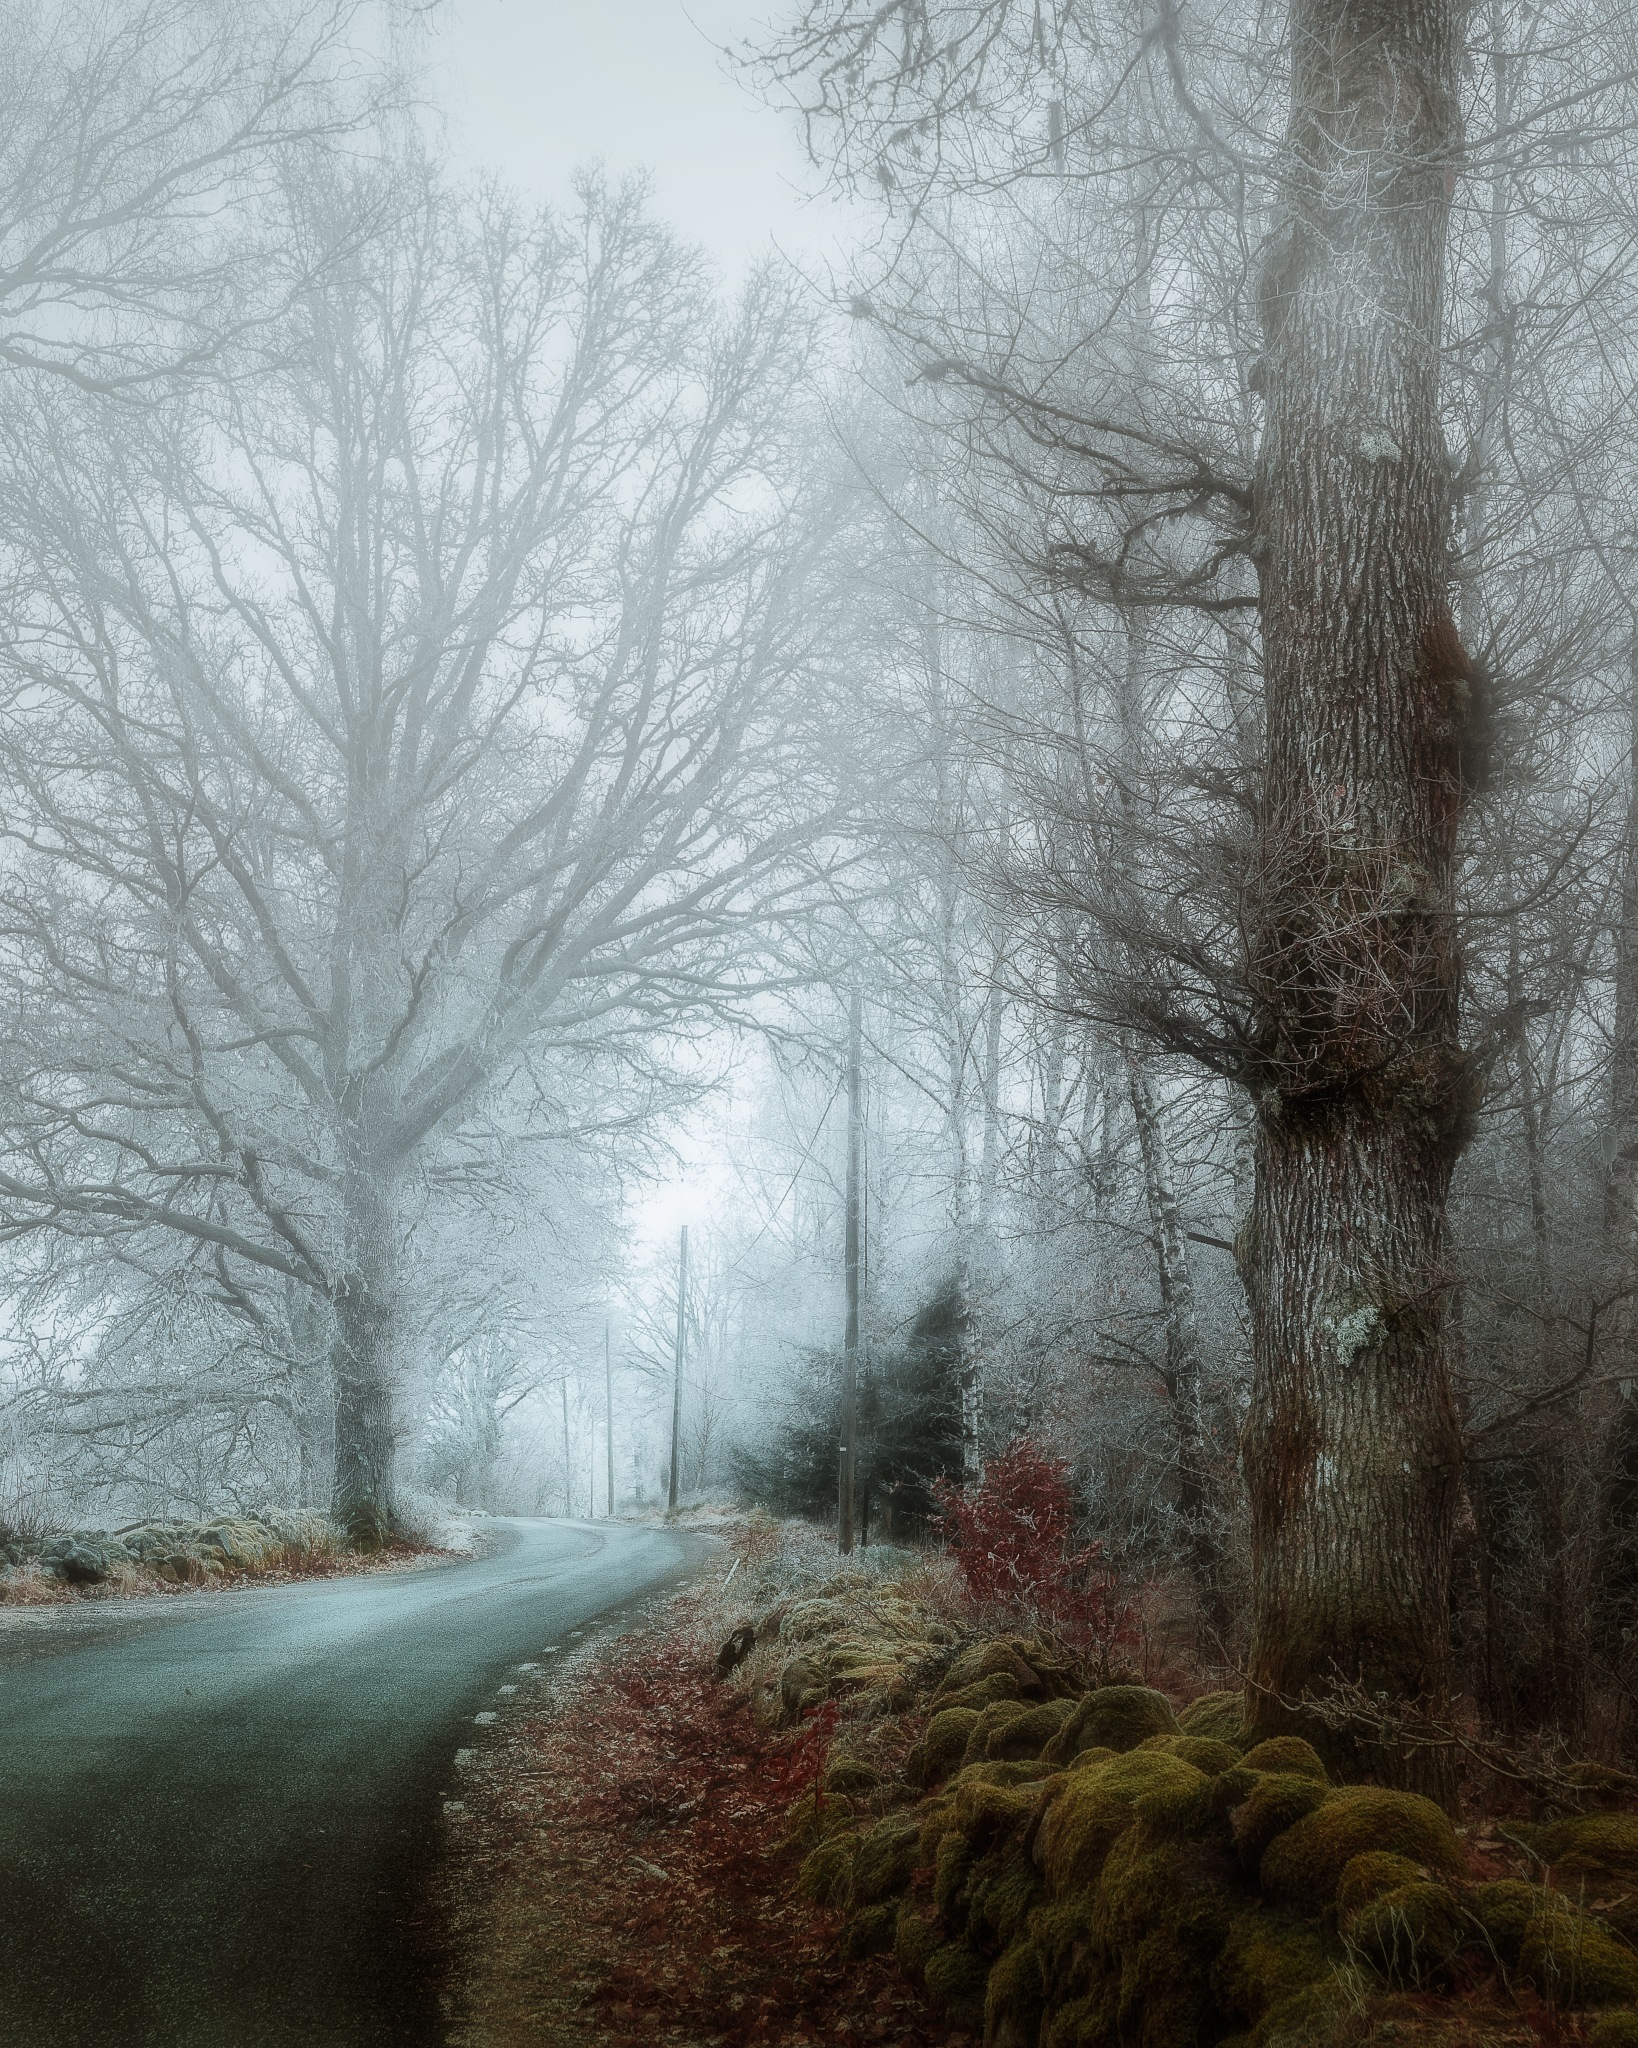 Road to Vesljunga by Göran Ebenhart